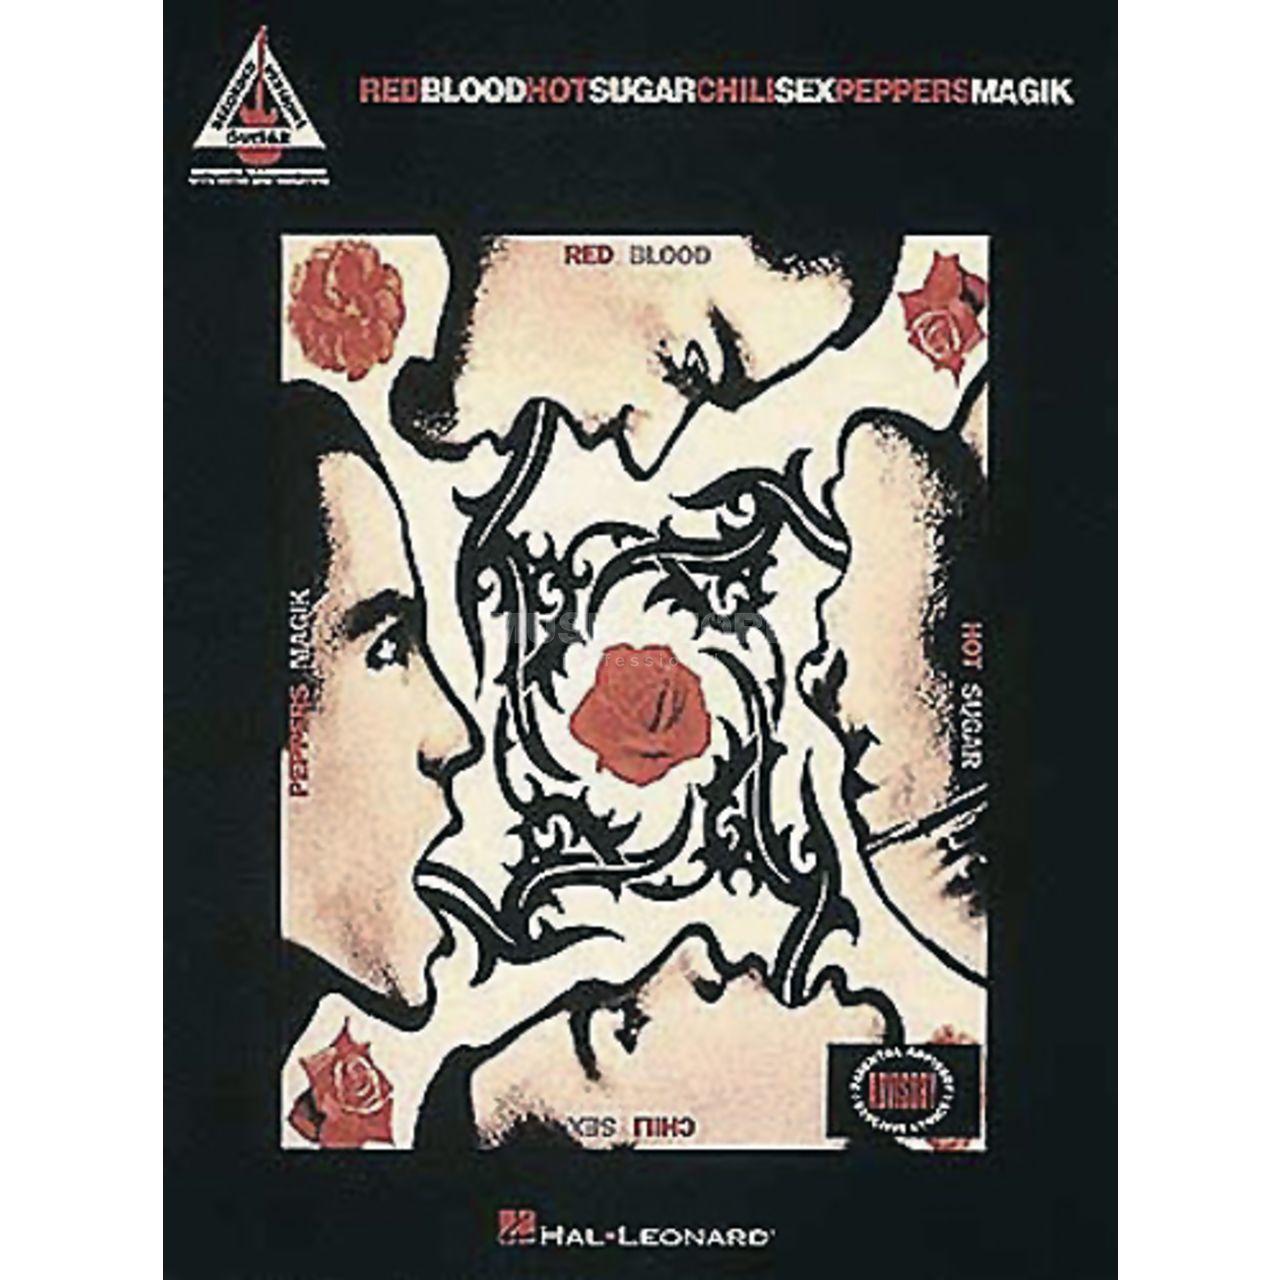 Blood sugar sex magik will know